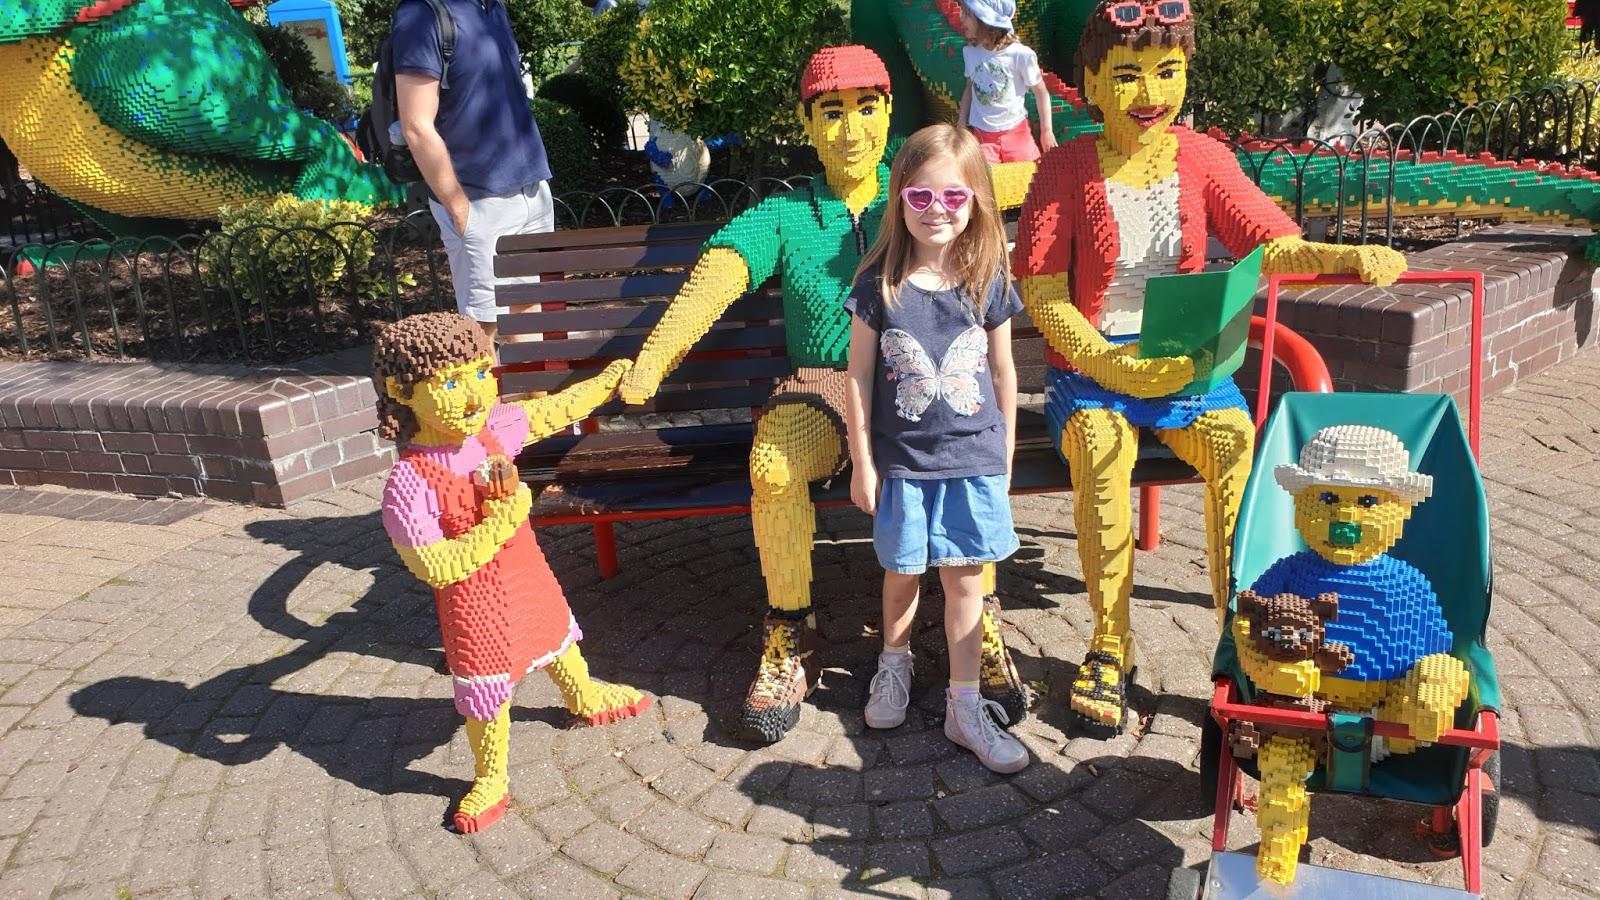 lego family models